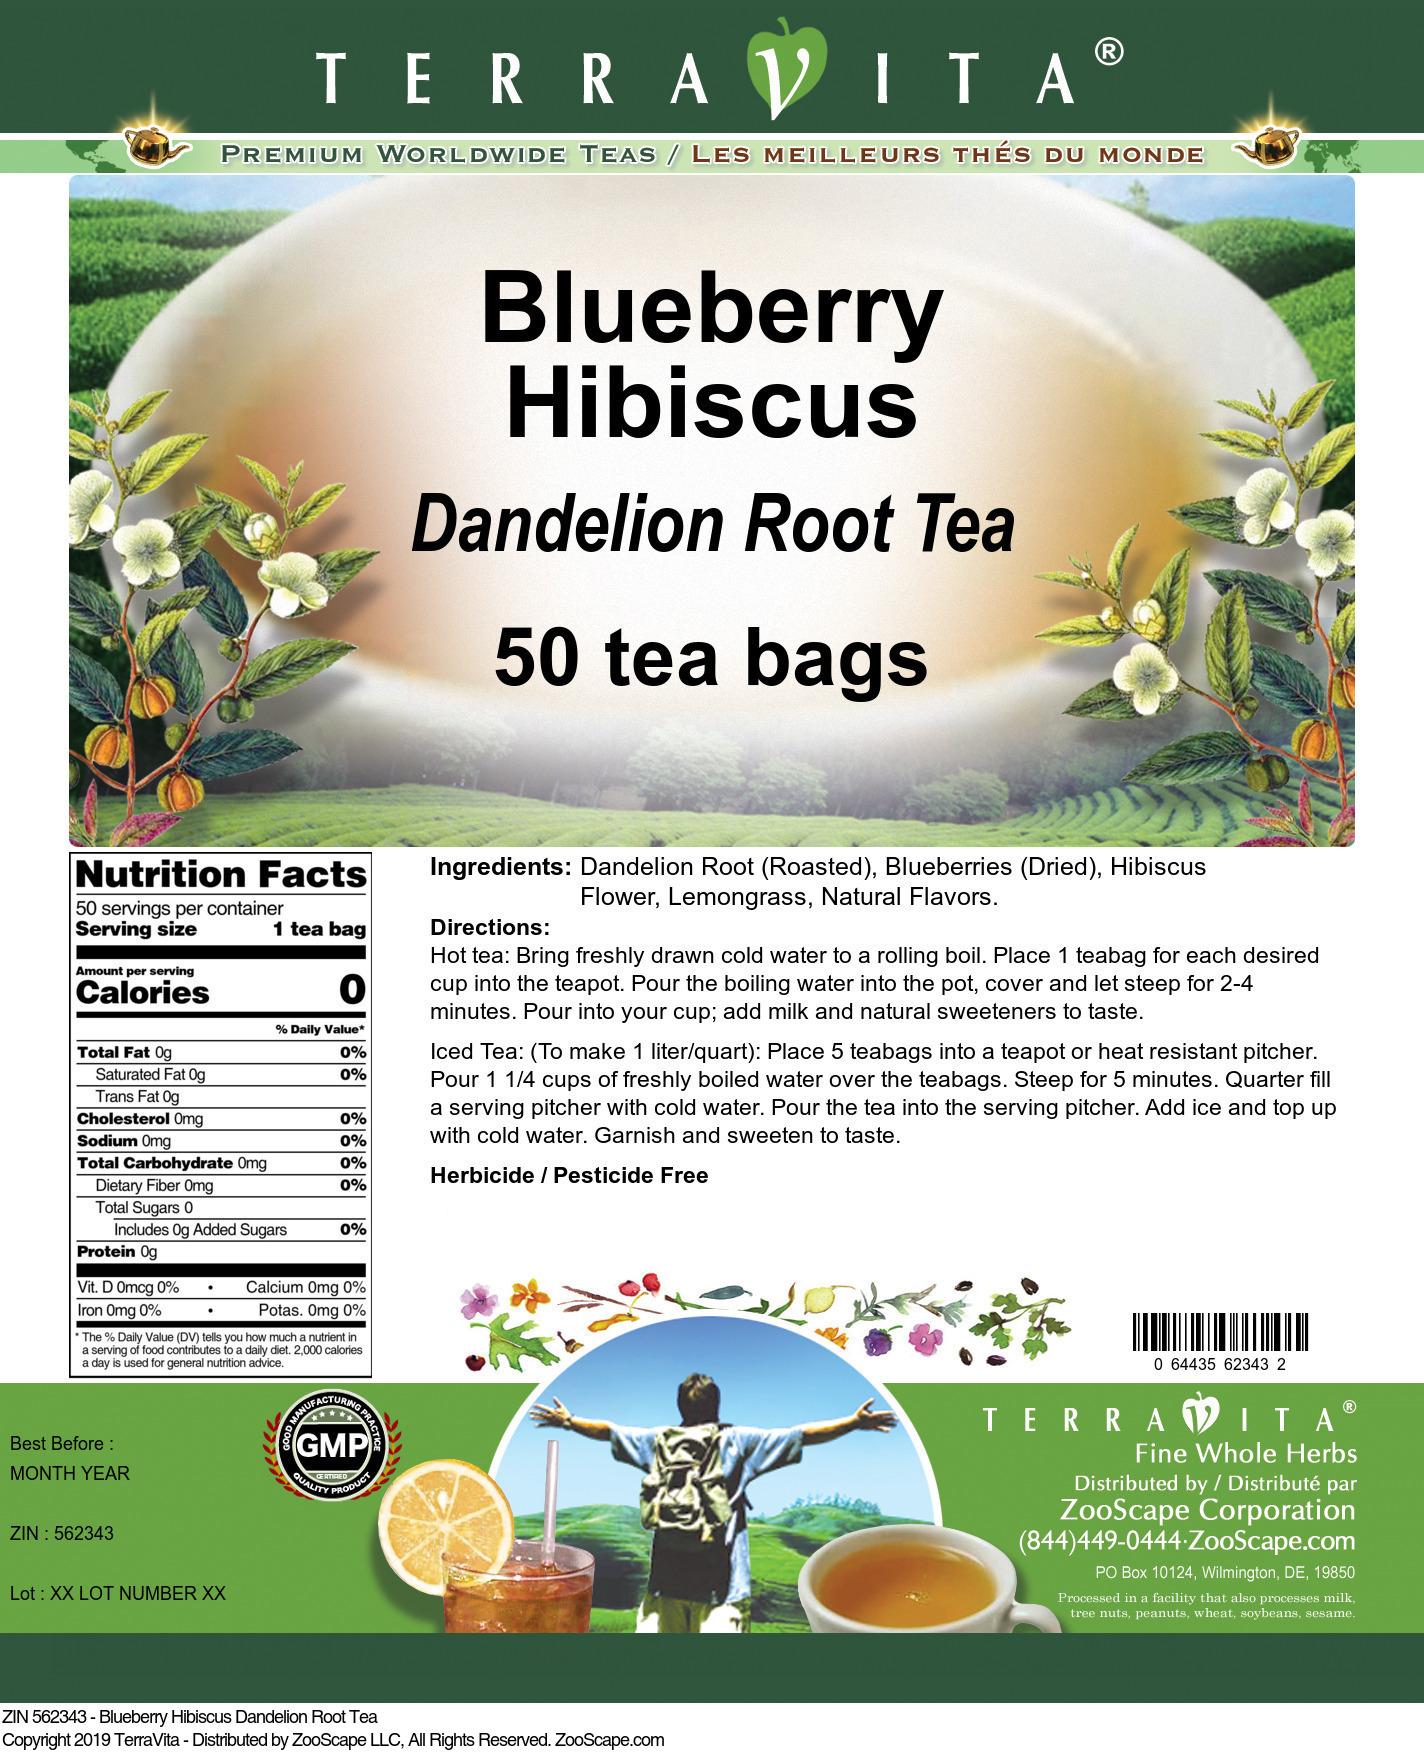 Blueberry Hibiscus Dandelion Root